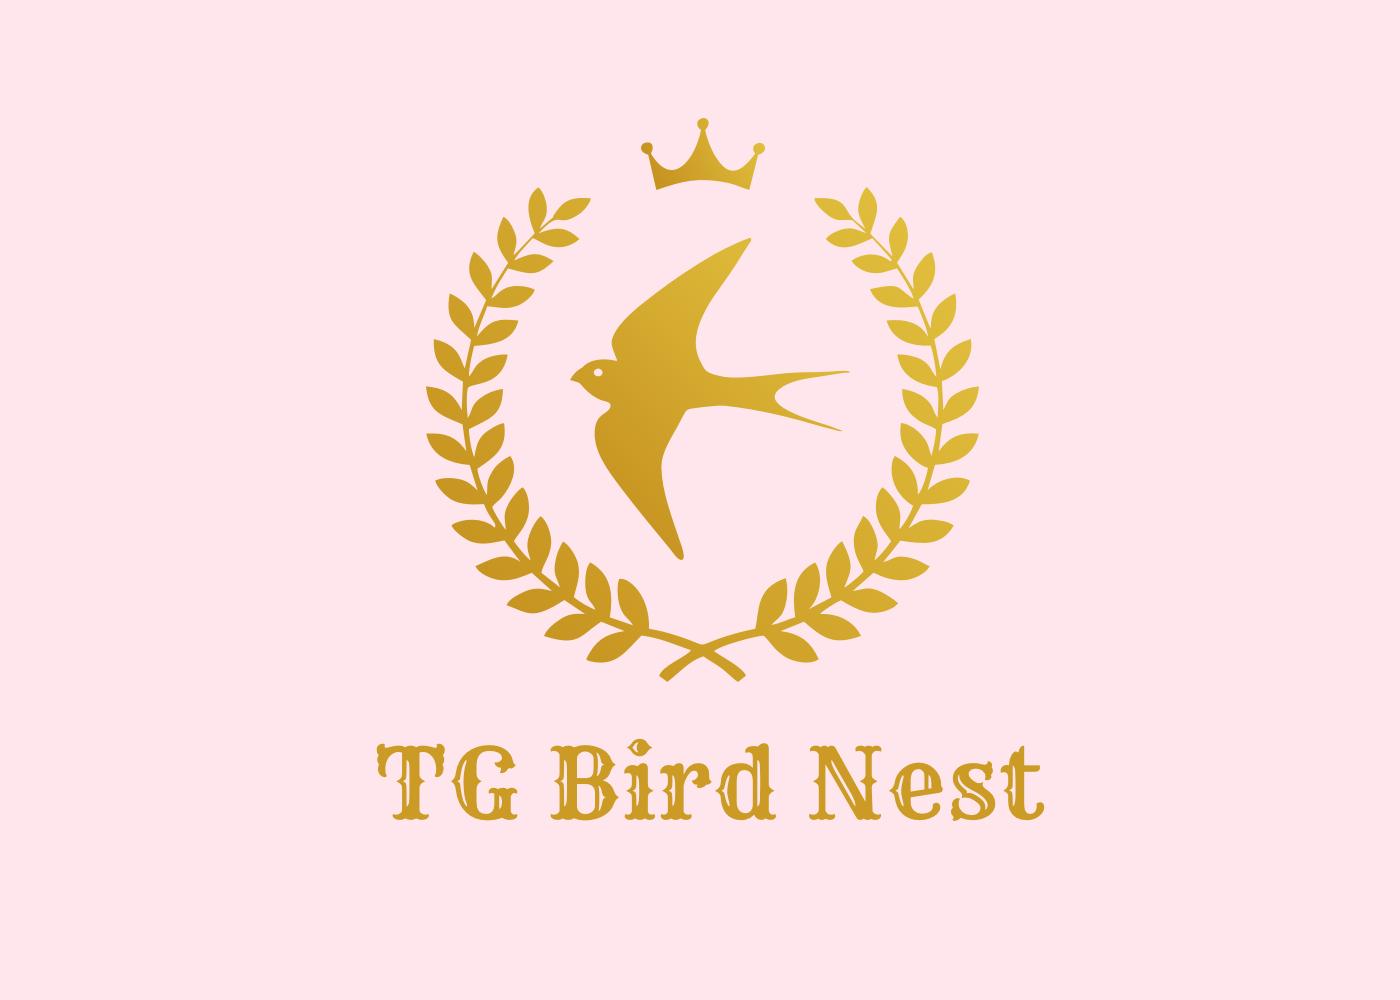 tg-bird-nest_logo_camapp_logo_design